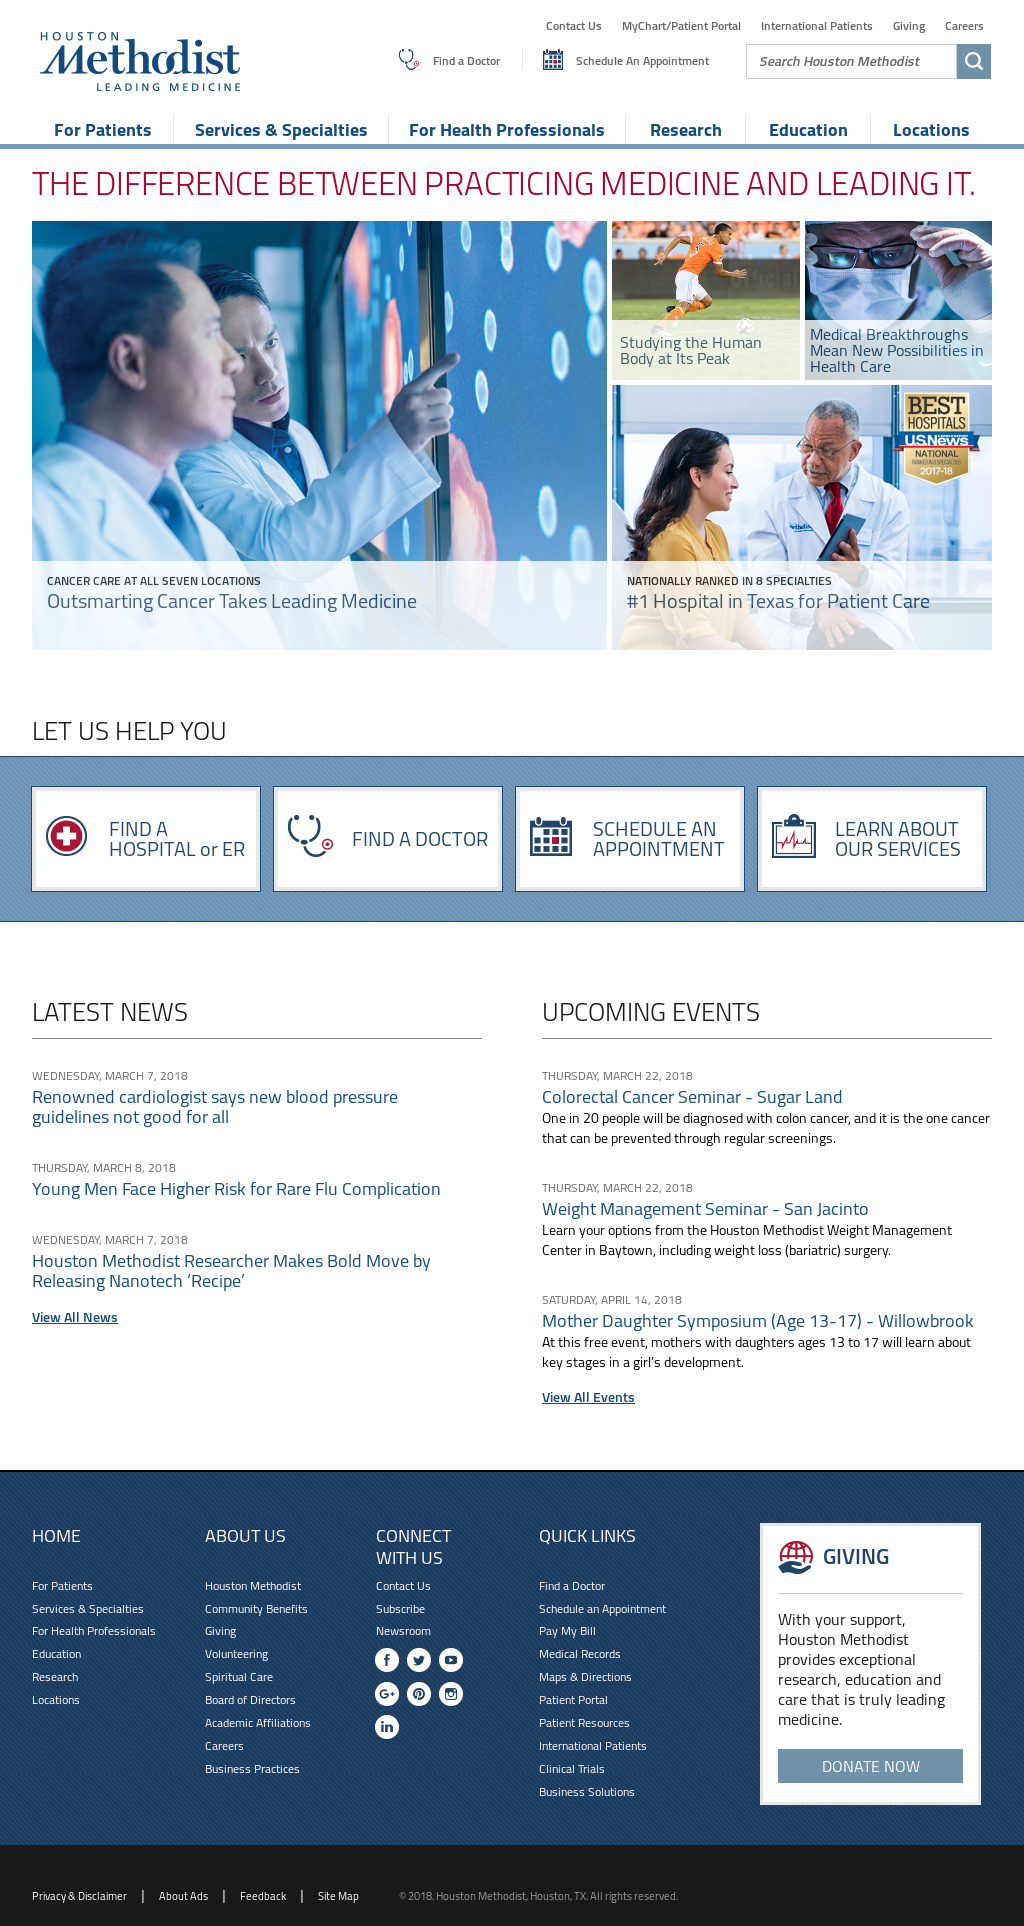 Houston Methodist Competitors, Revenue and Employees - Owler